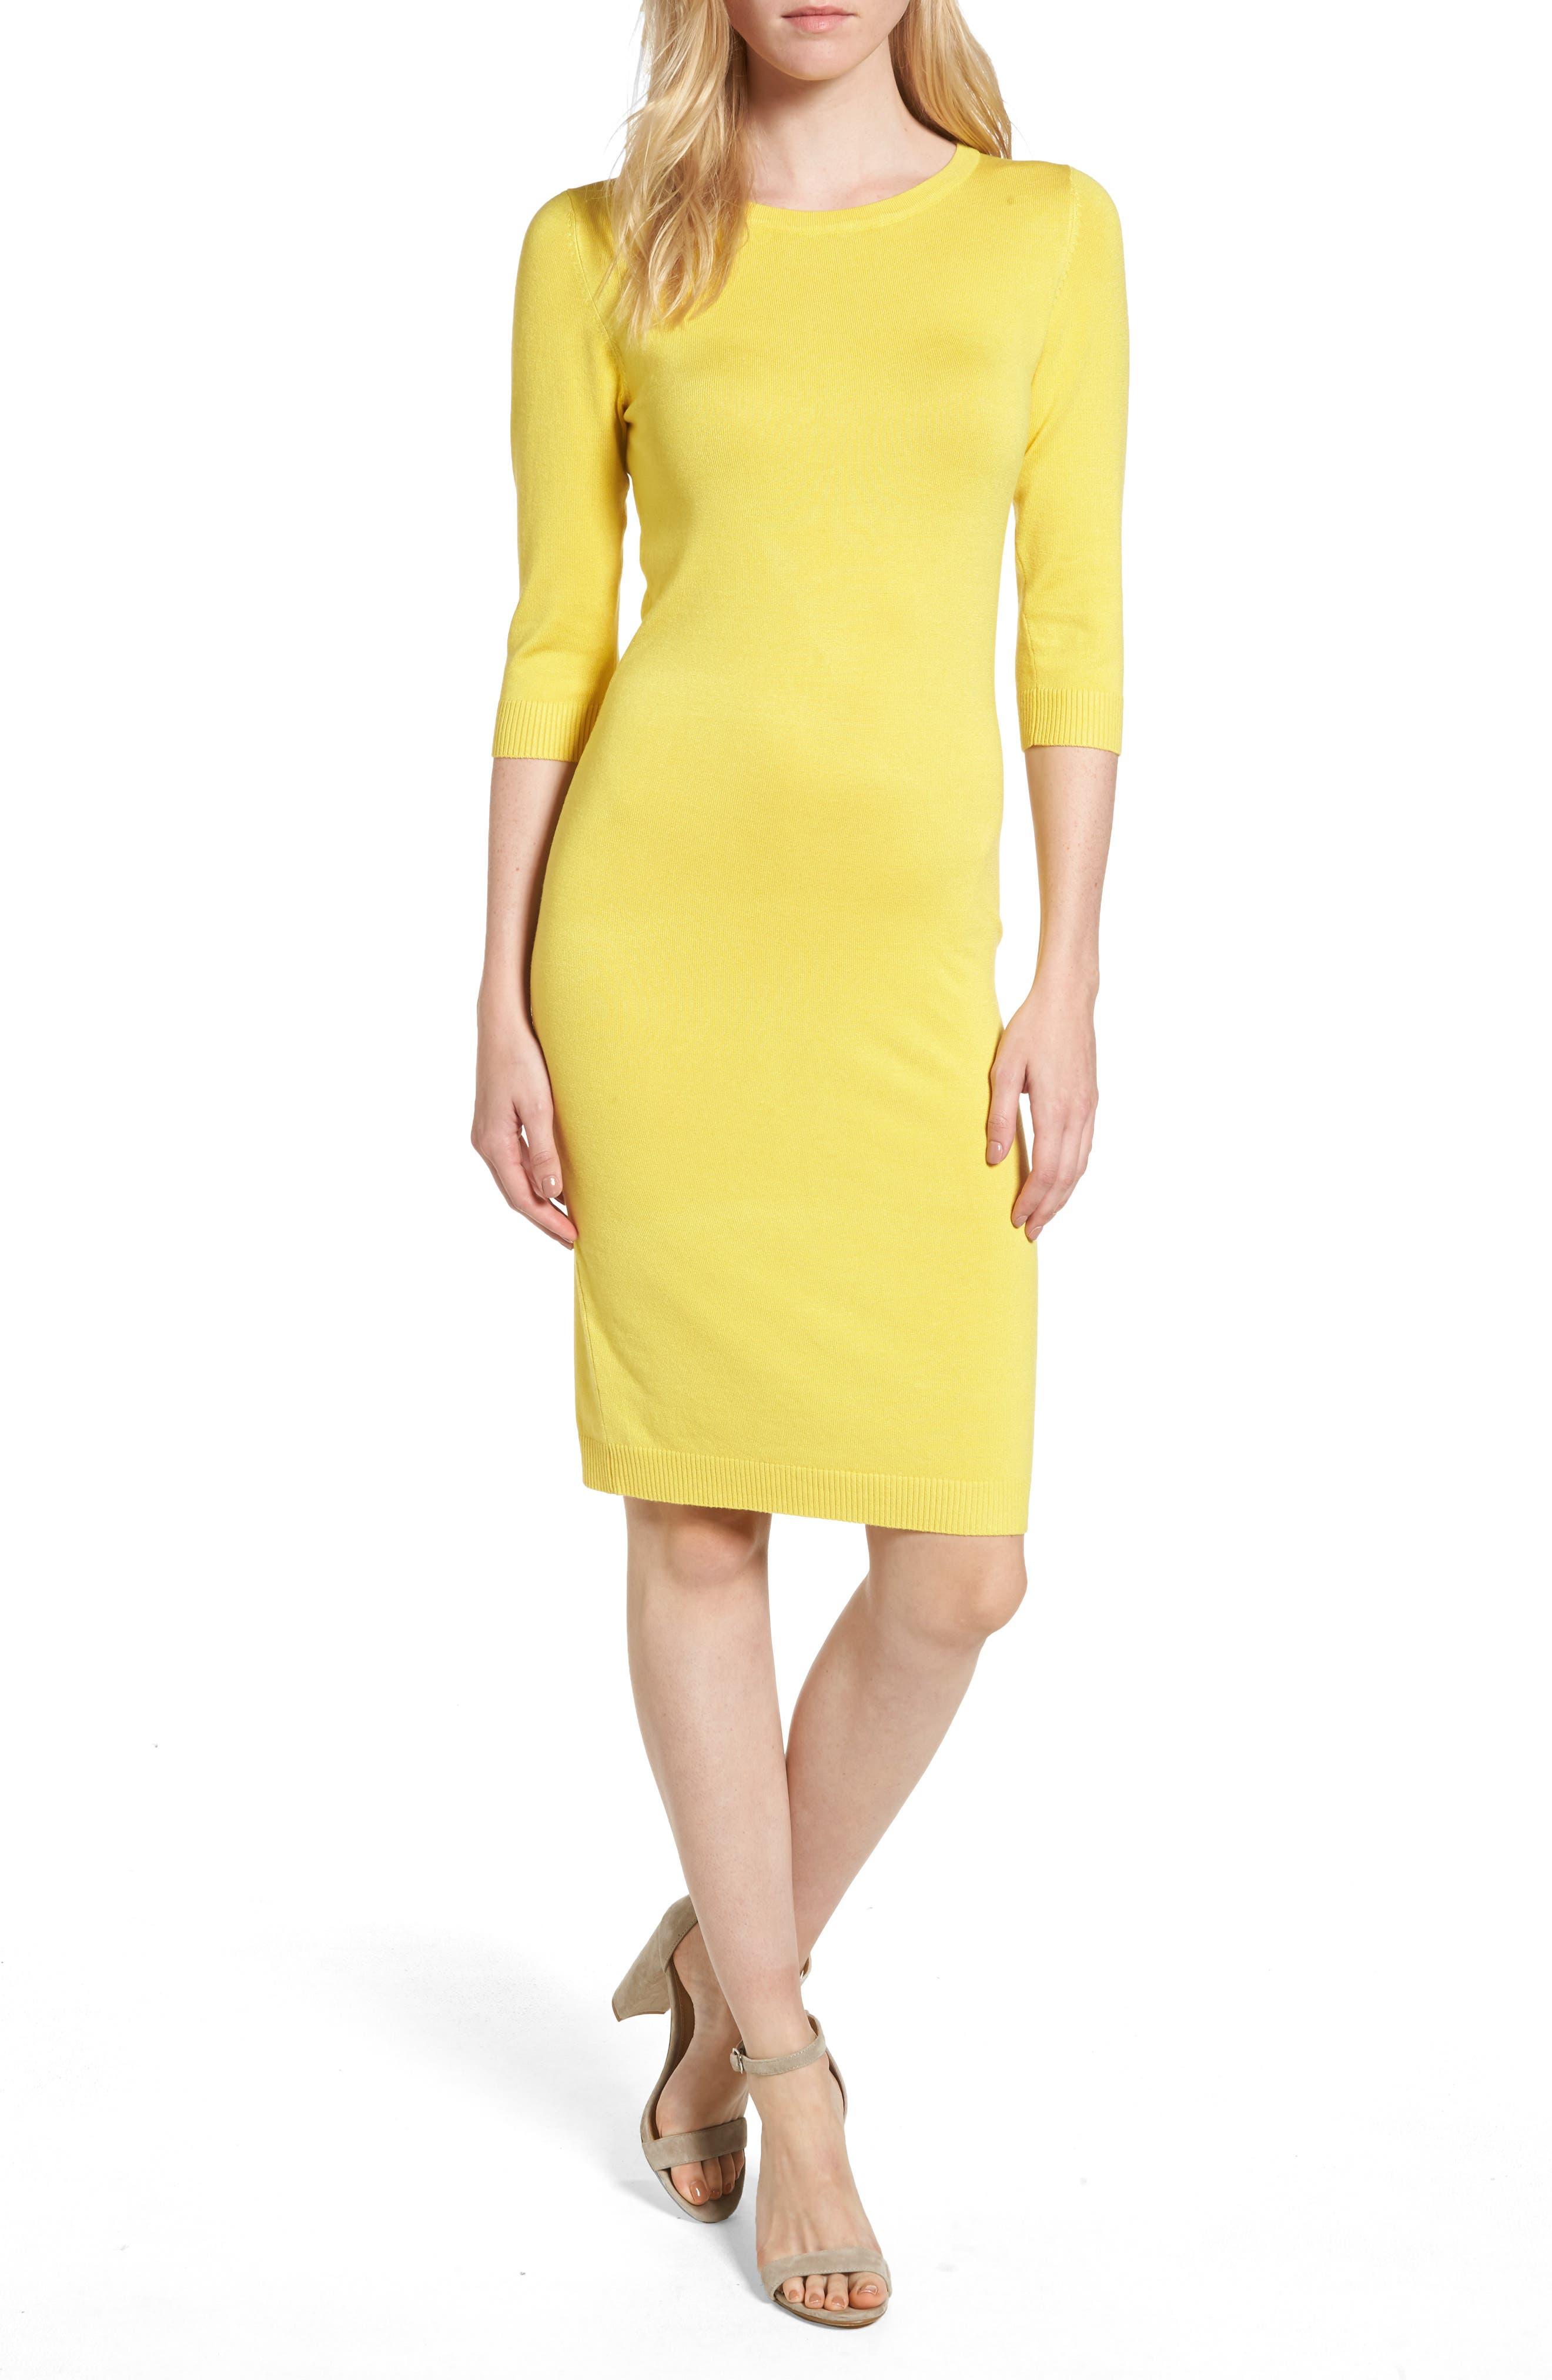 Yellow dress shirt 20 neck